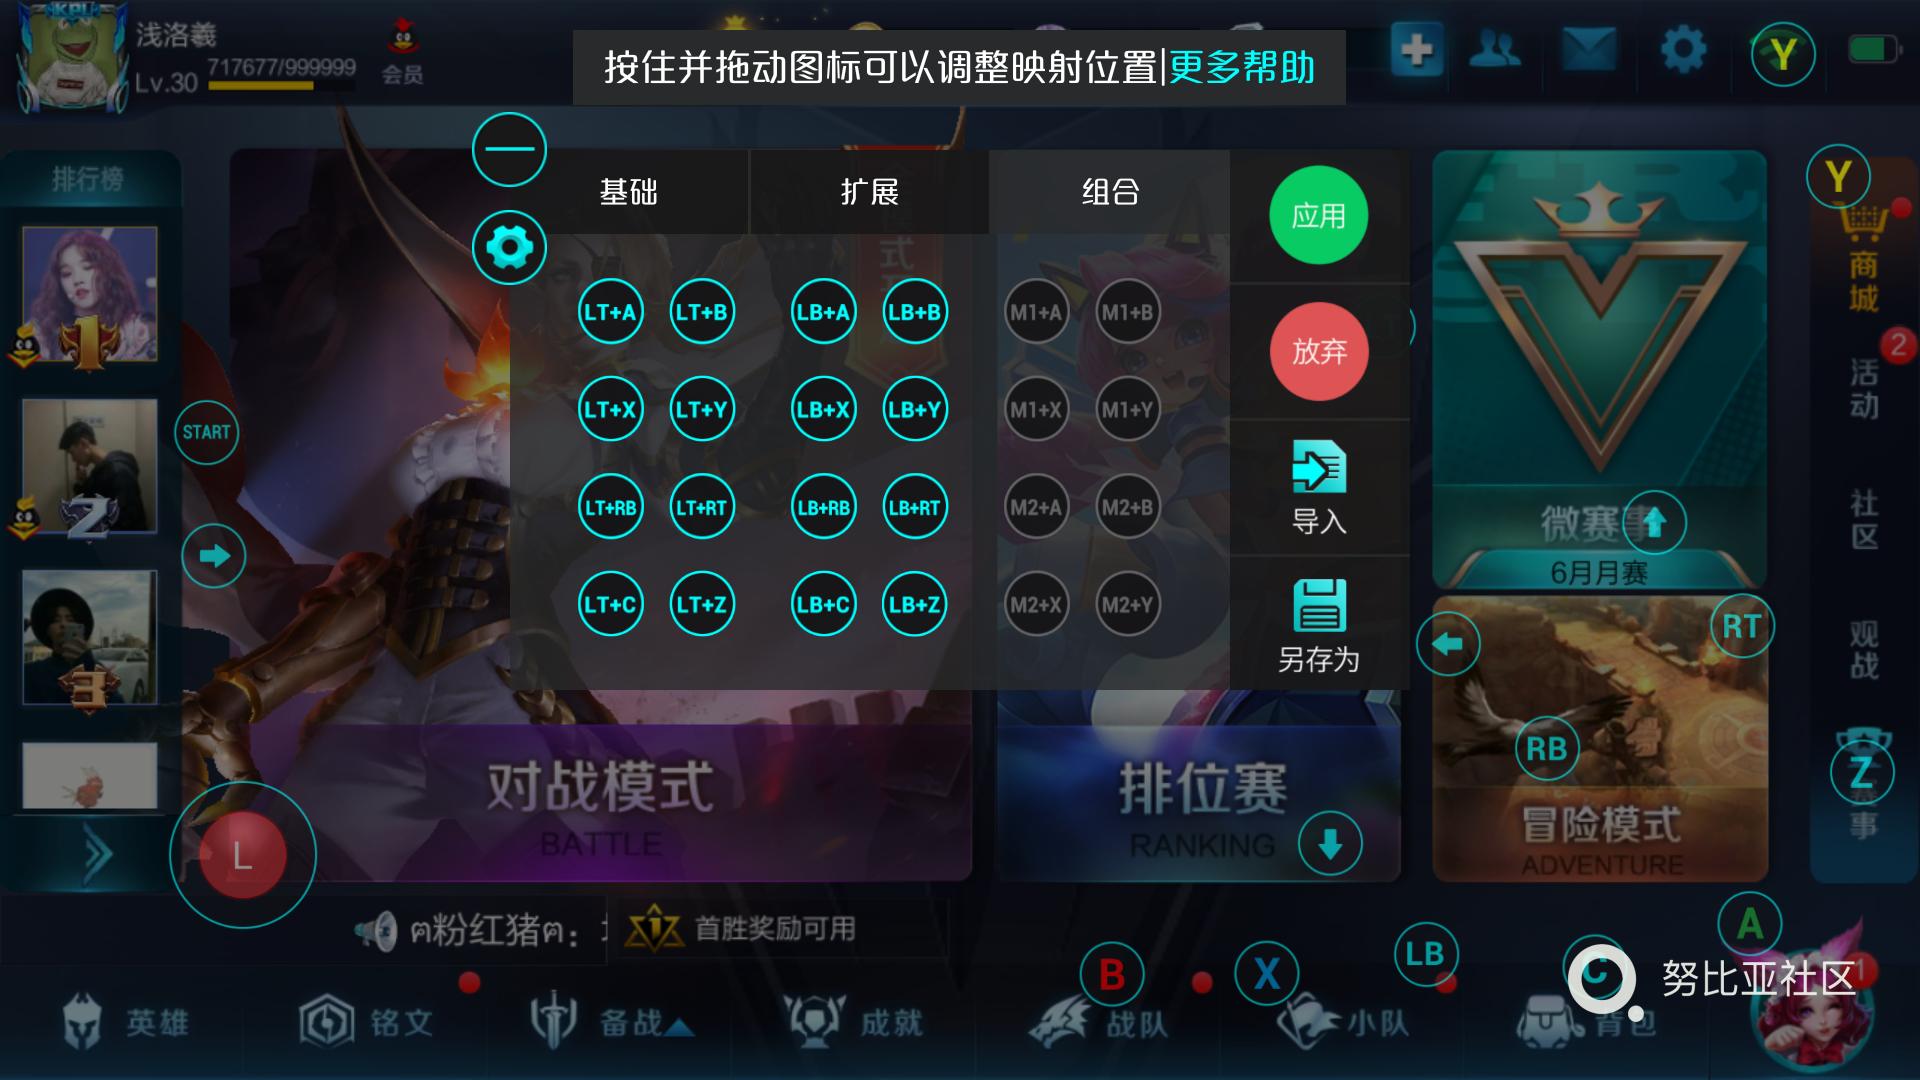 Screenshot_2018-06-10-01-05-18.png